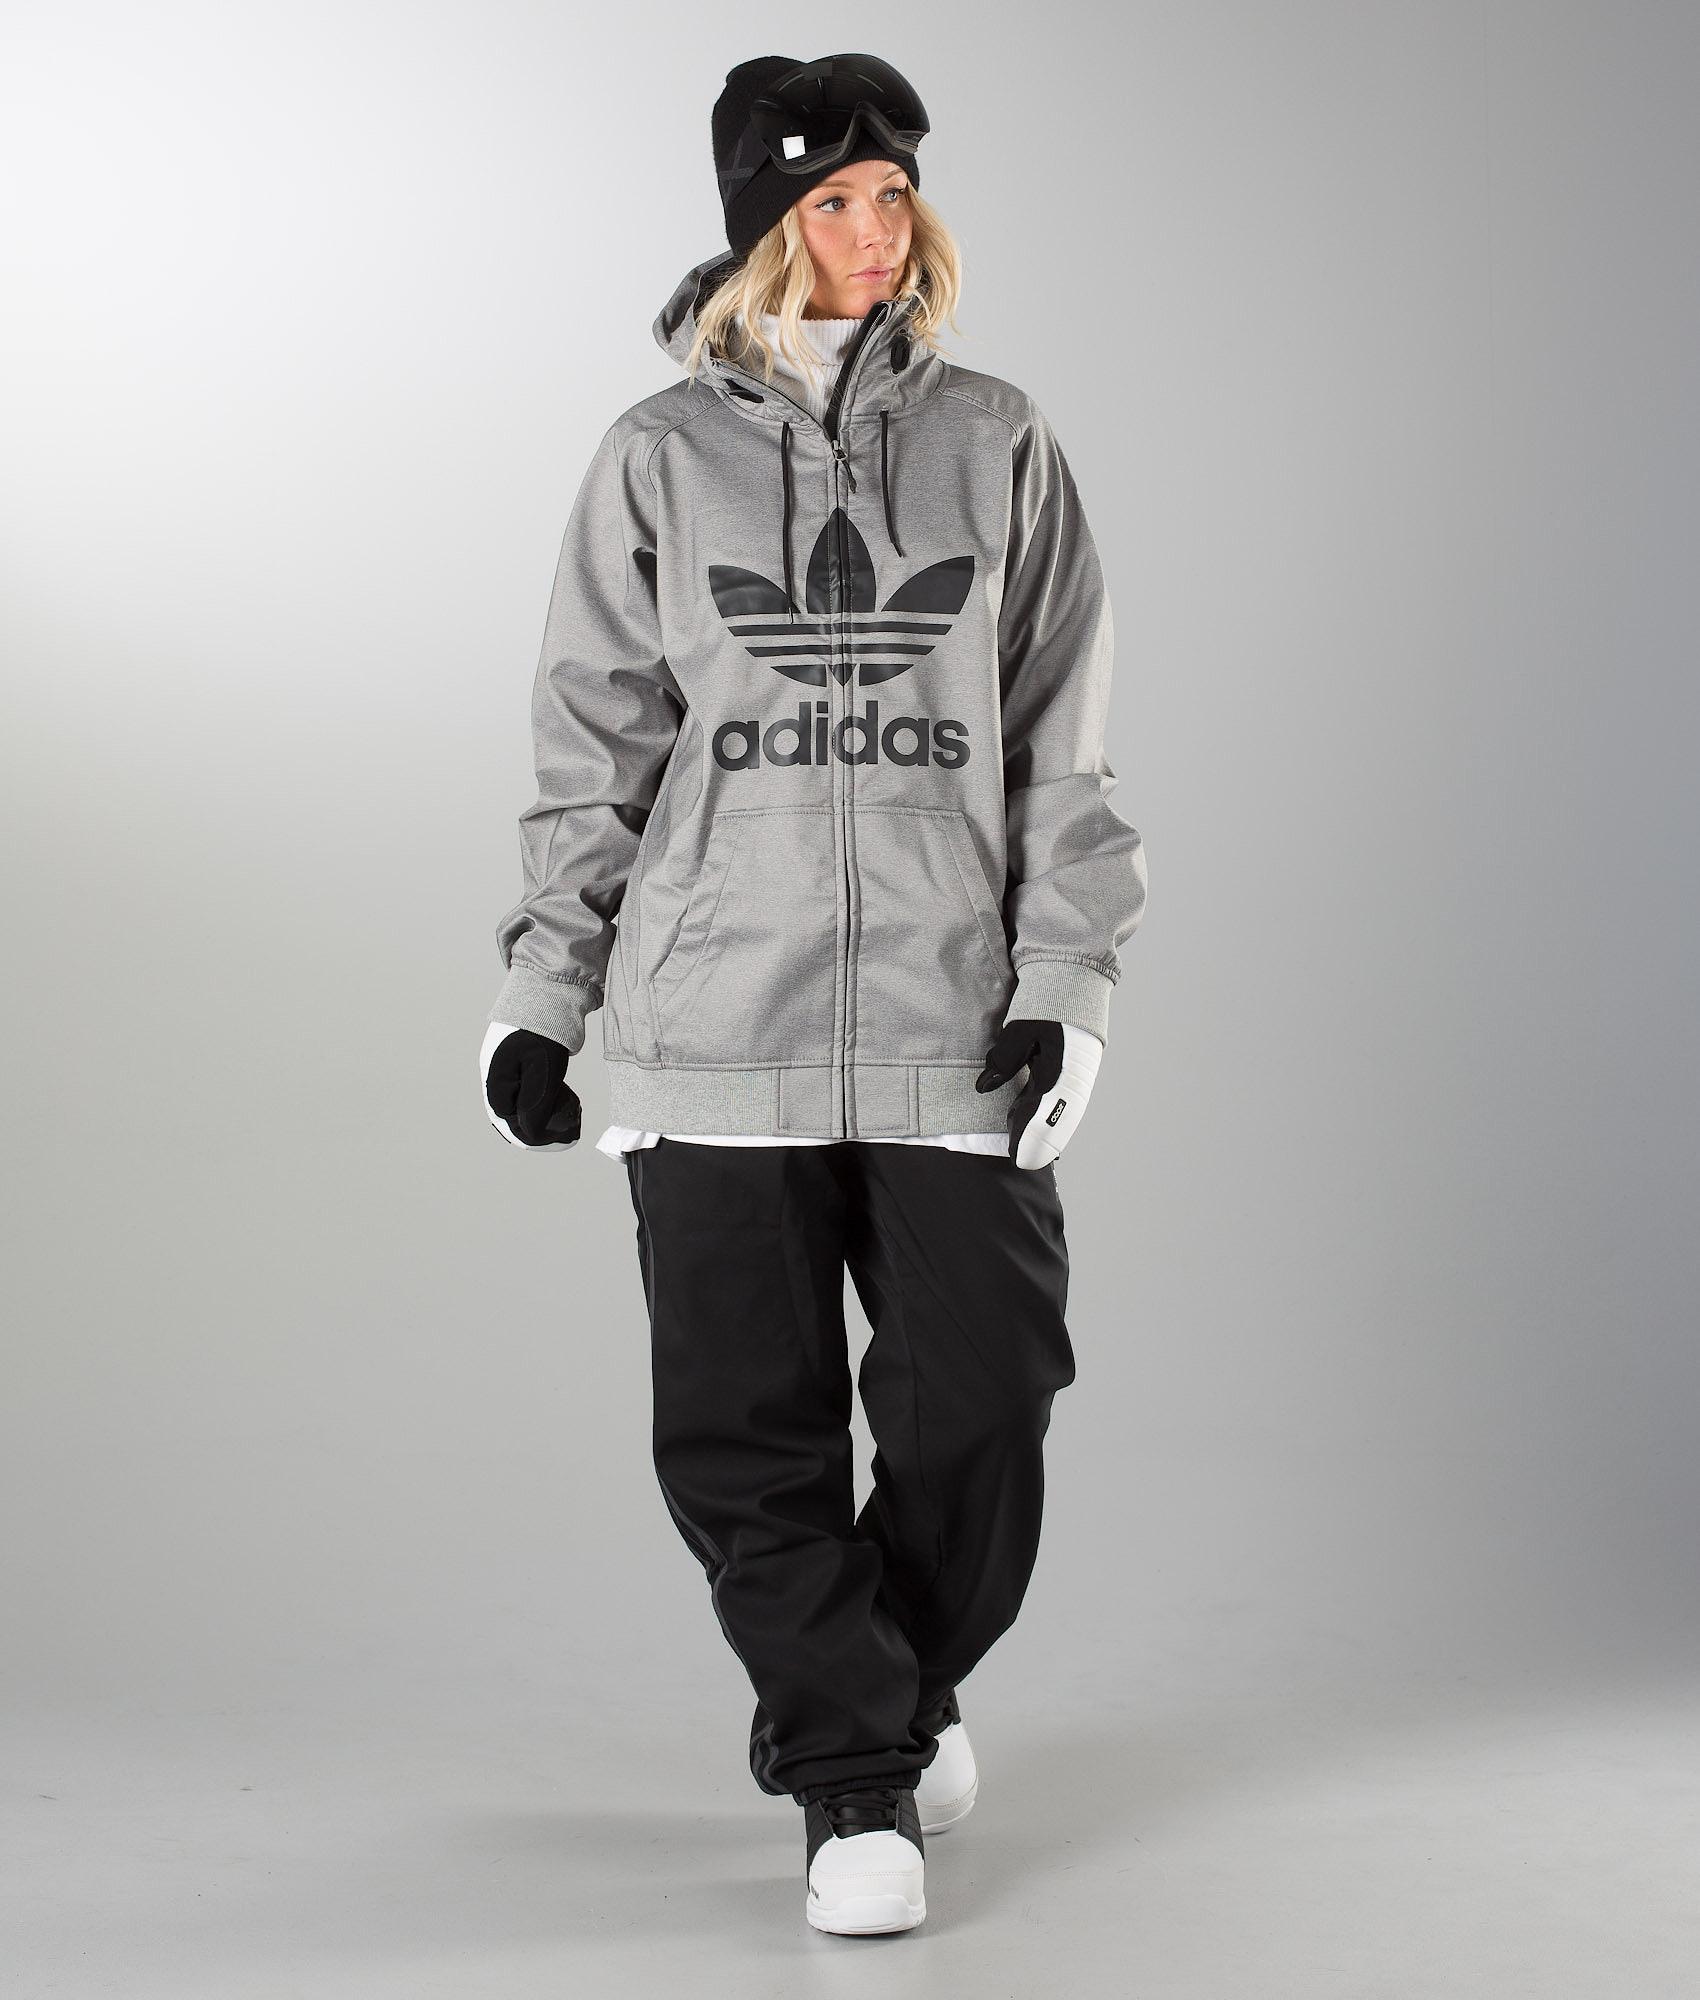 Adidas Snowboarding Greeley Unisex Snowboardjacke Corhtr Black ... 9336df6dad